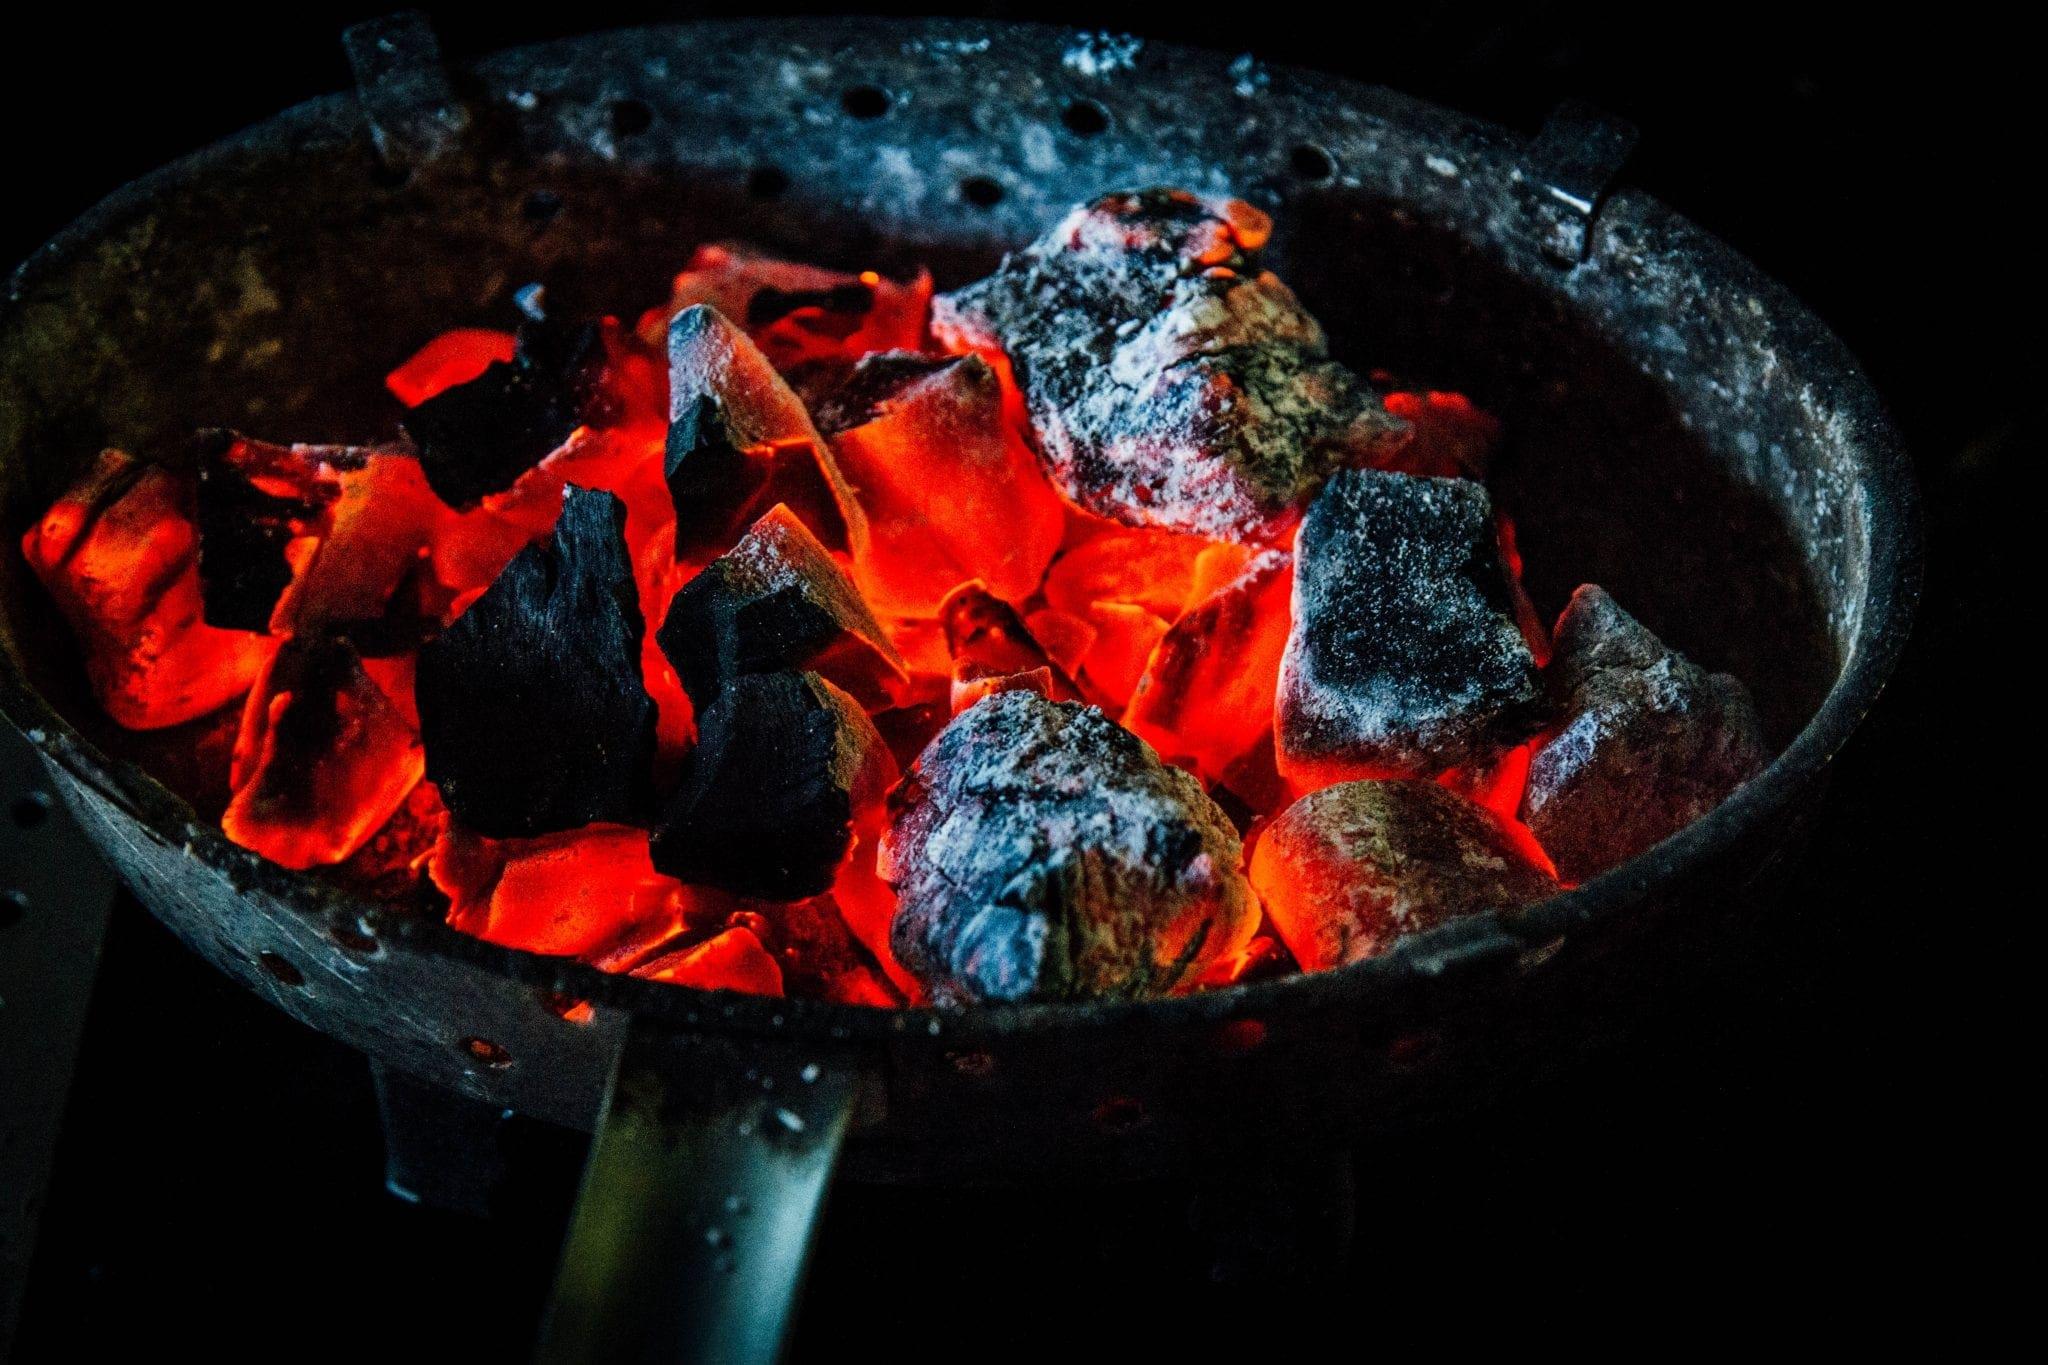 burning charcoals